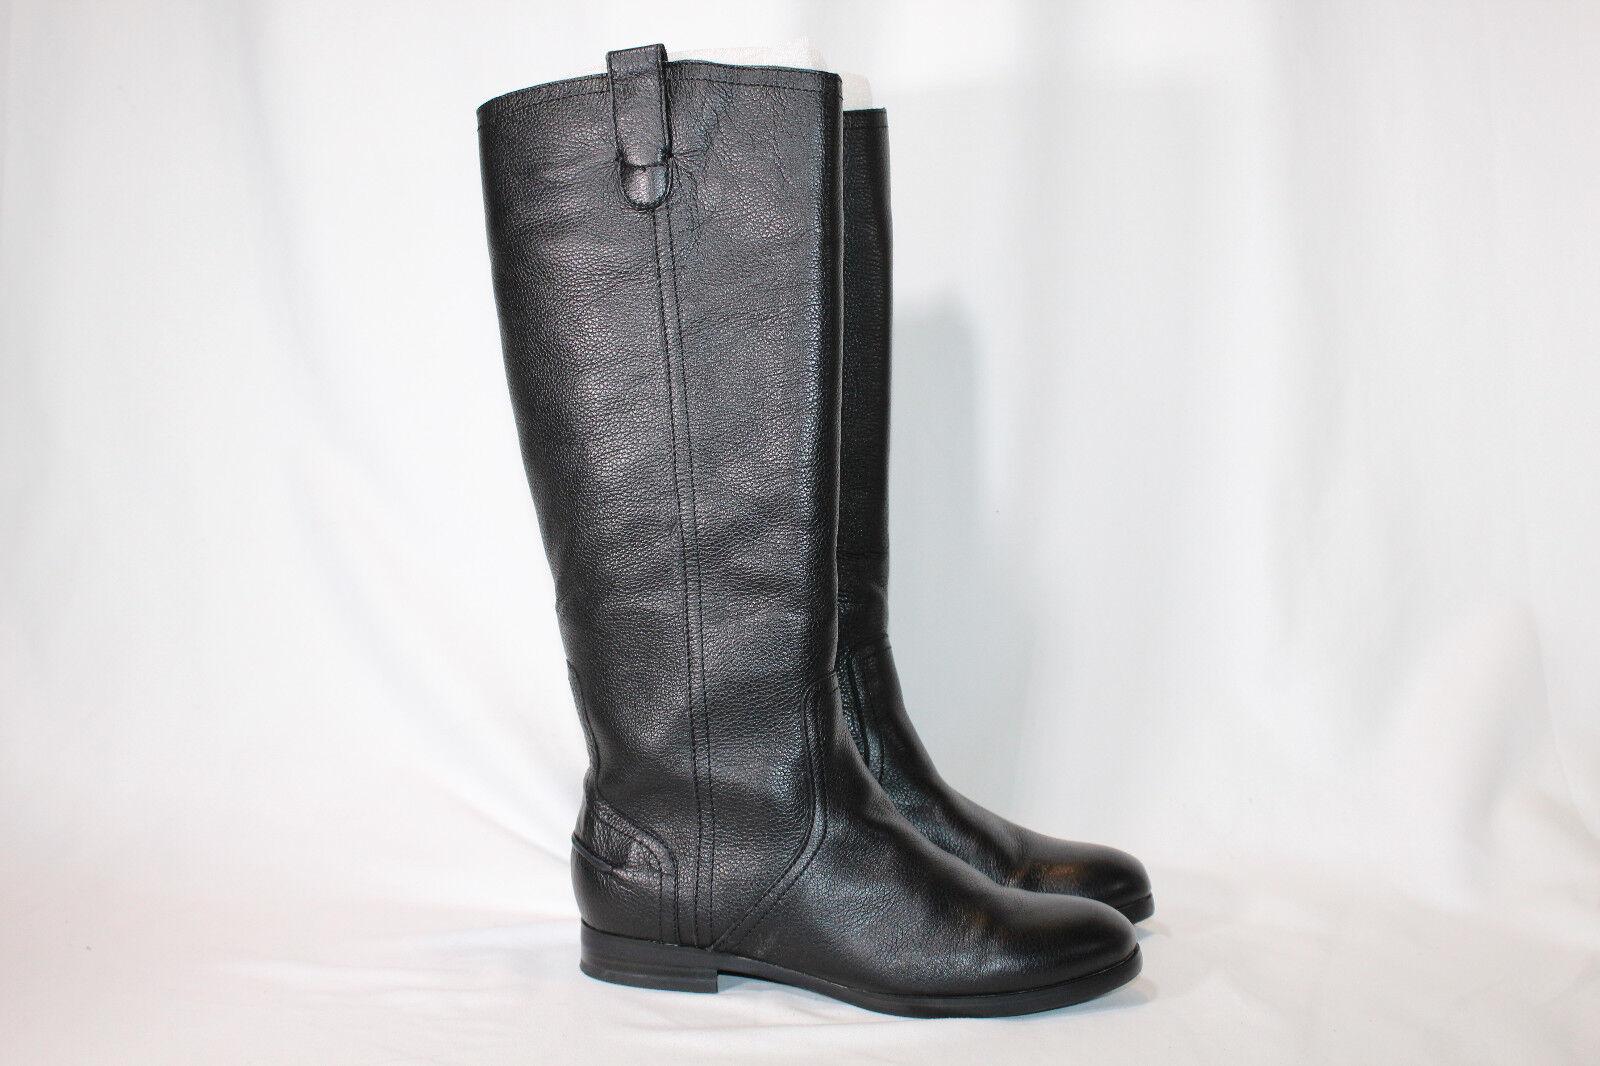 H by Halston Pebble Leather Riding Boots  Amy 6.5 medium black